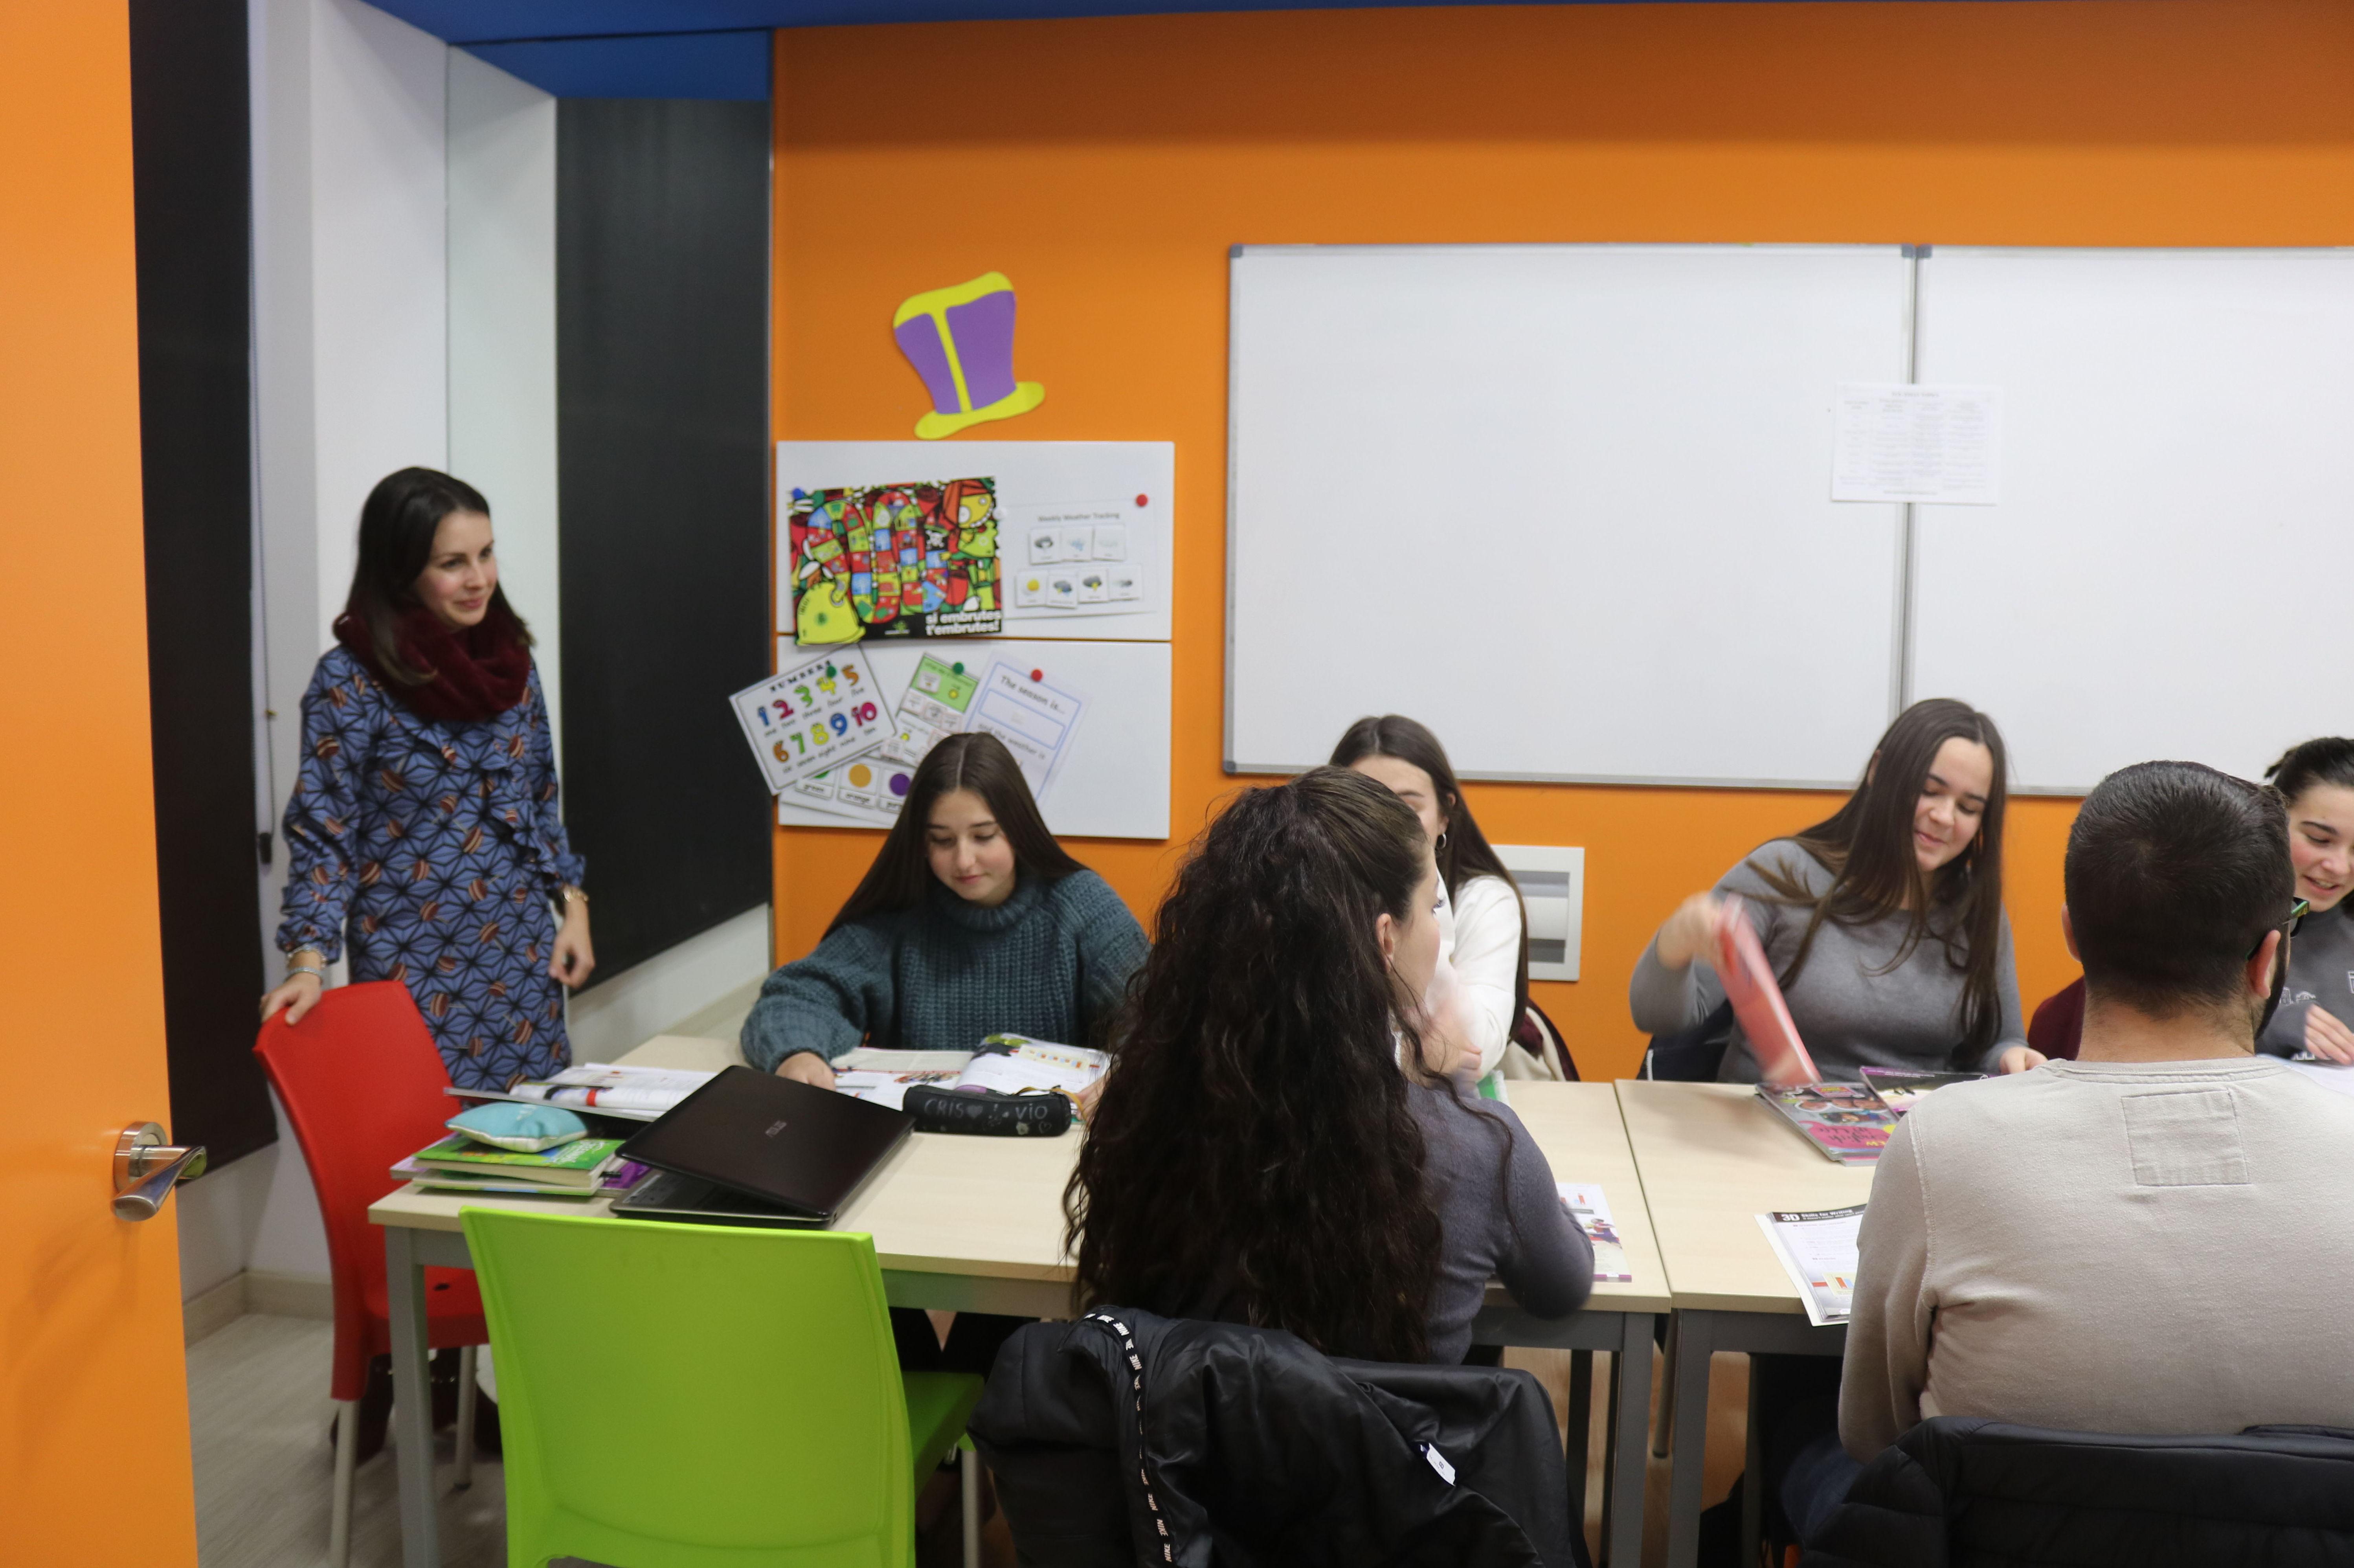 Foto 12 de Academias de idiomas en Moncada | Centre d'Estudis Etnies